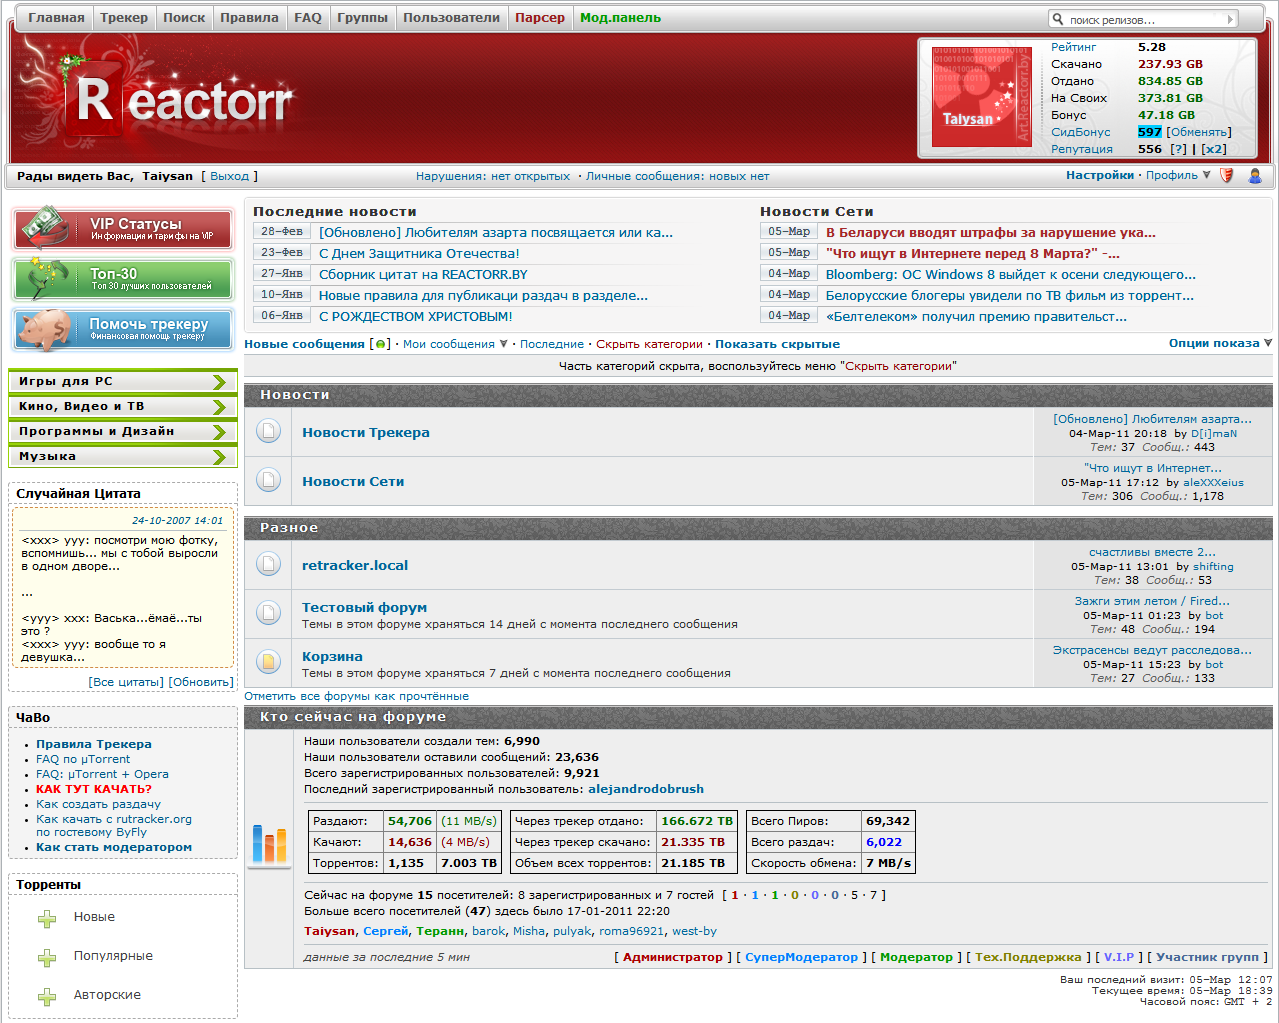 Дизайн торрент-трекера Reactorr.by (new)